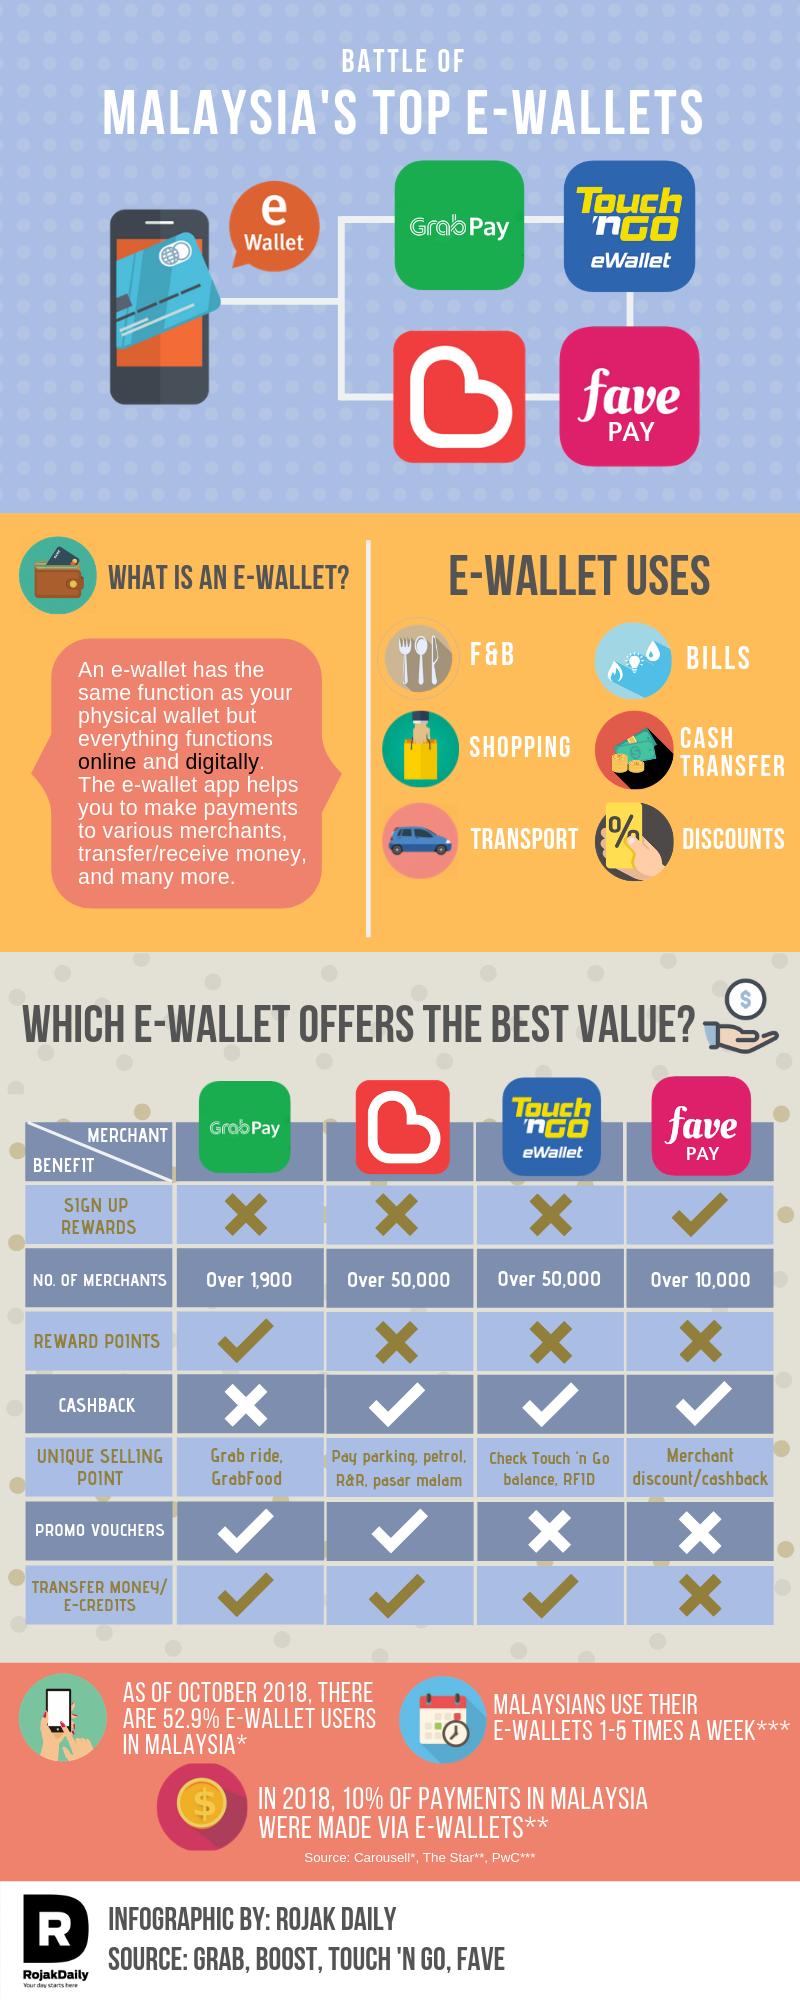 GempakSpot: Battle Of Malaysian E-Wallets: Who Offers The Best